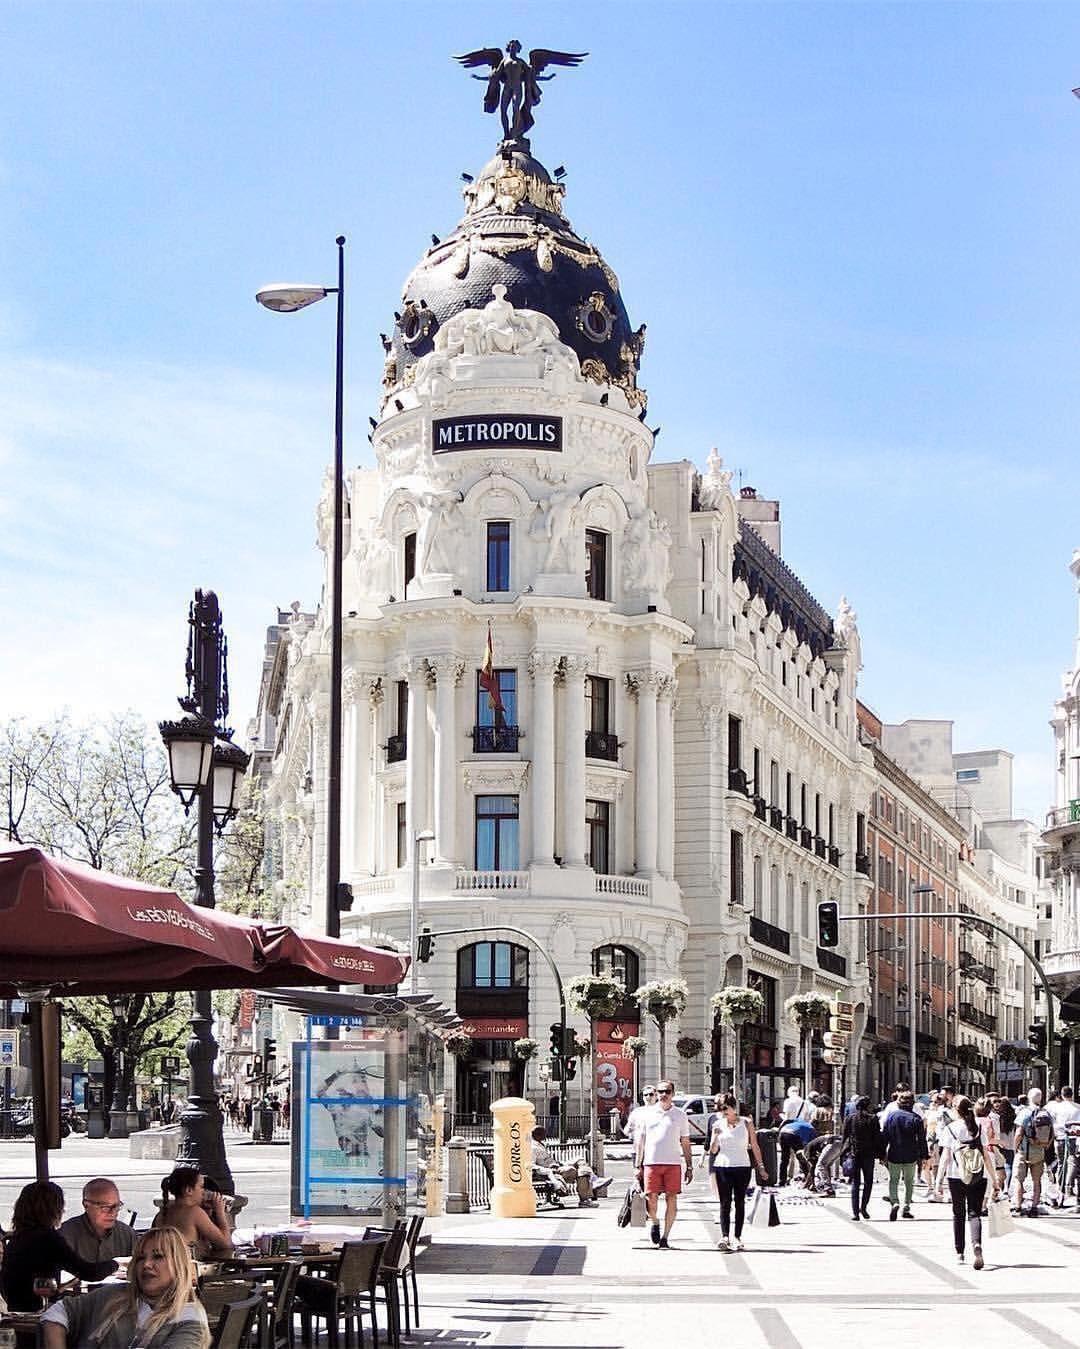 "4,060 Likes, 19 Comments - Spain (@topspainphoto) on Instagram: ""FOLLOW @topmadridphoto • TOP Spain 📷  @cla_lady • #topspainphoto Visita la galería de nuestro…"""